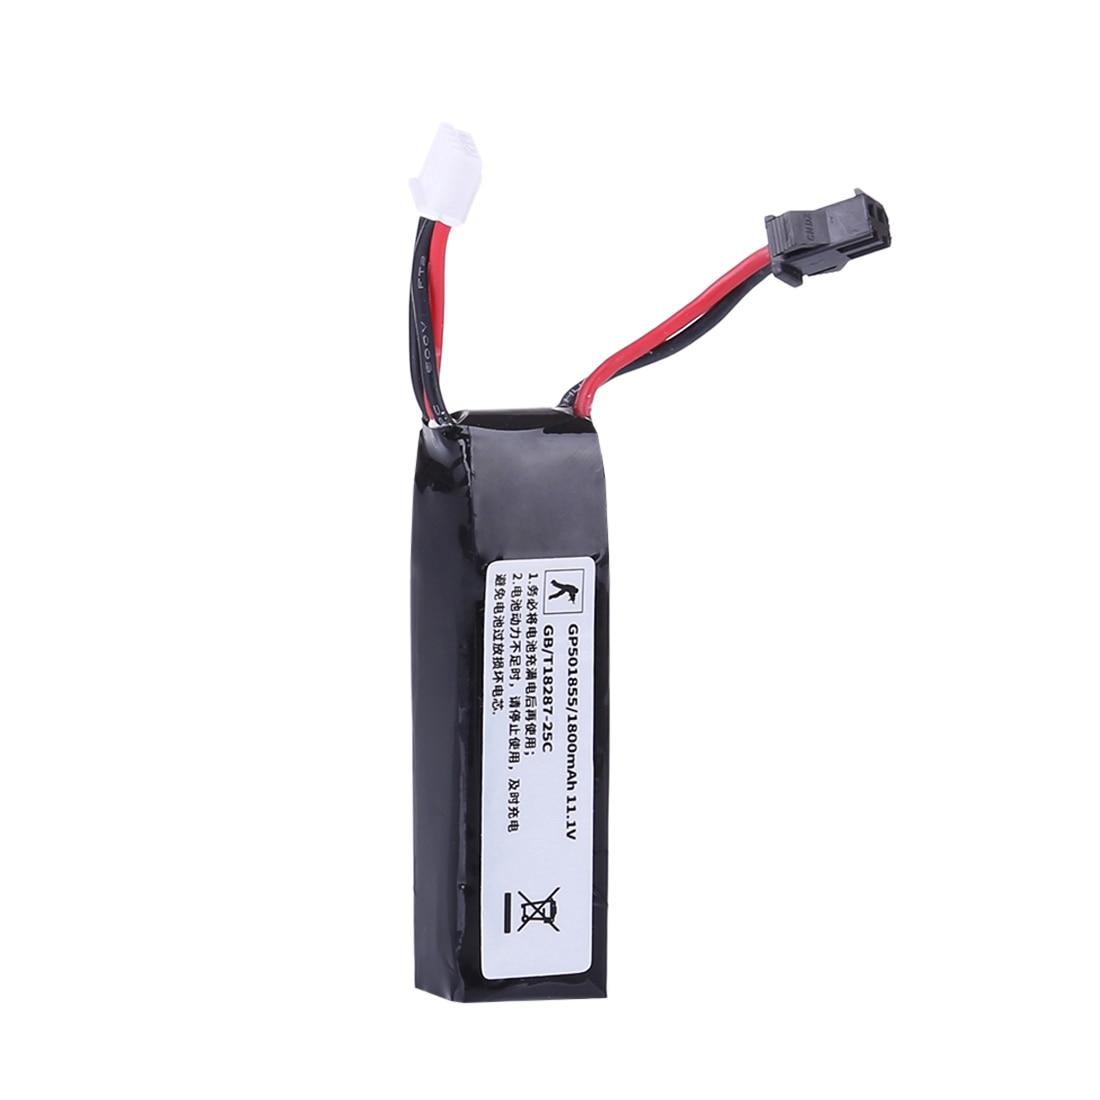 11,1 V 1800mah 25c Mini batería portátil de polímero de alta tasa de descarga de litio para JM Gen.8 / JM Gen.9 / JM Scar /XWE G36 Gel de agua